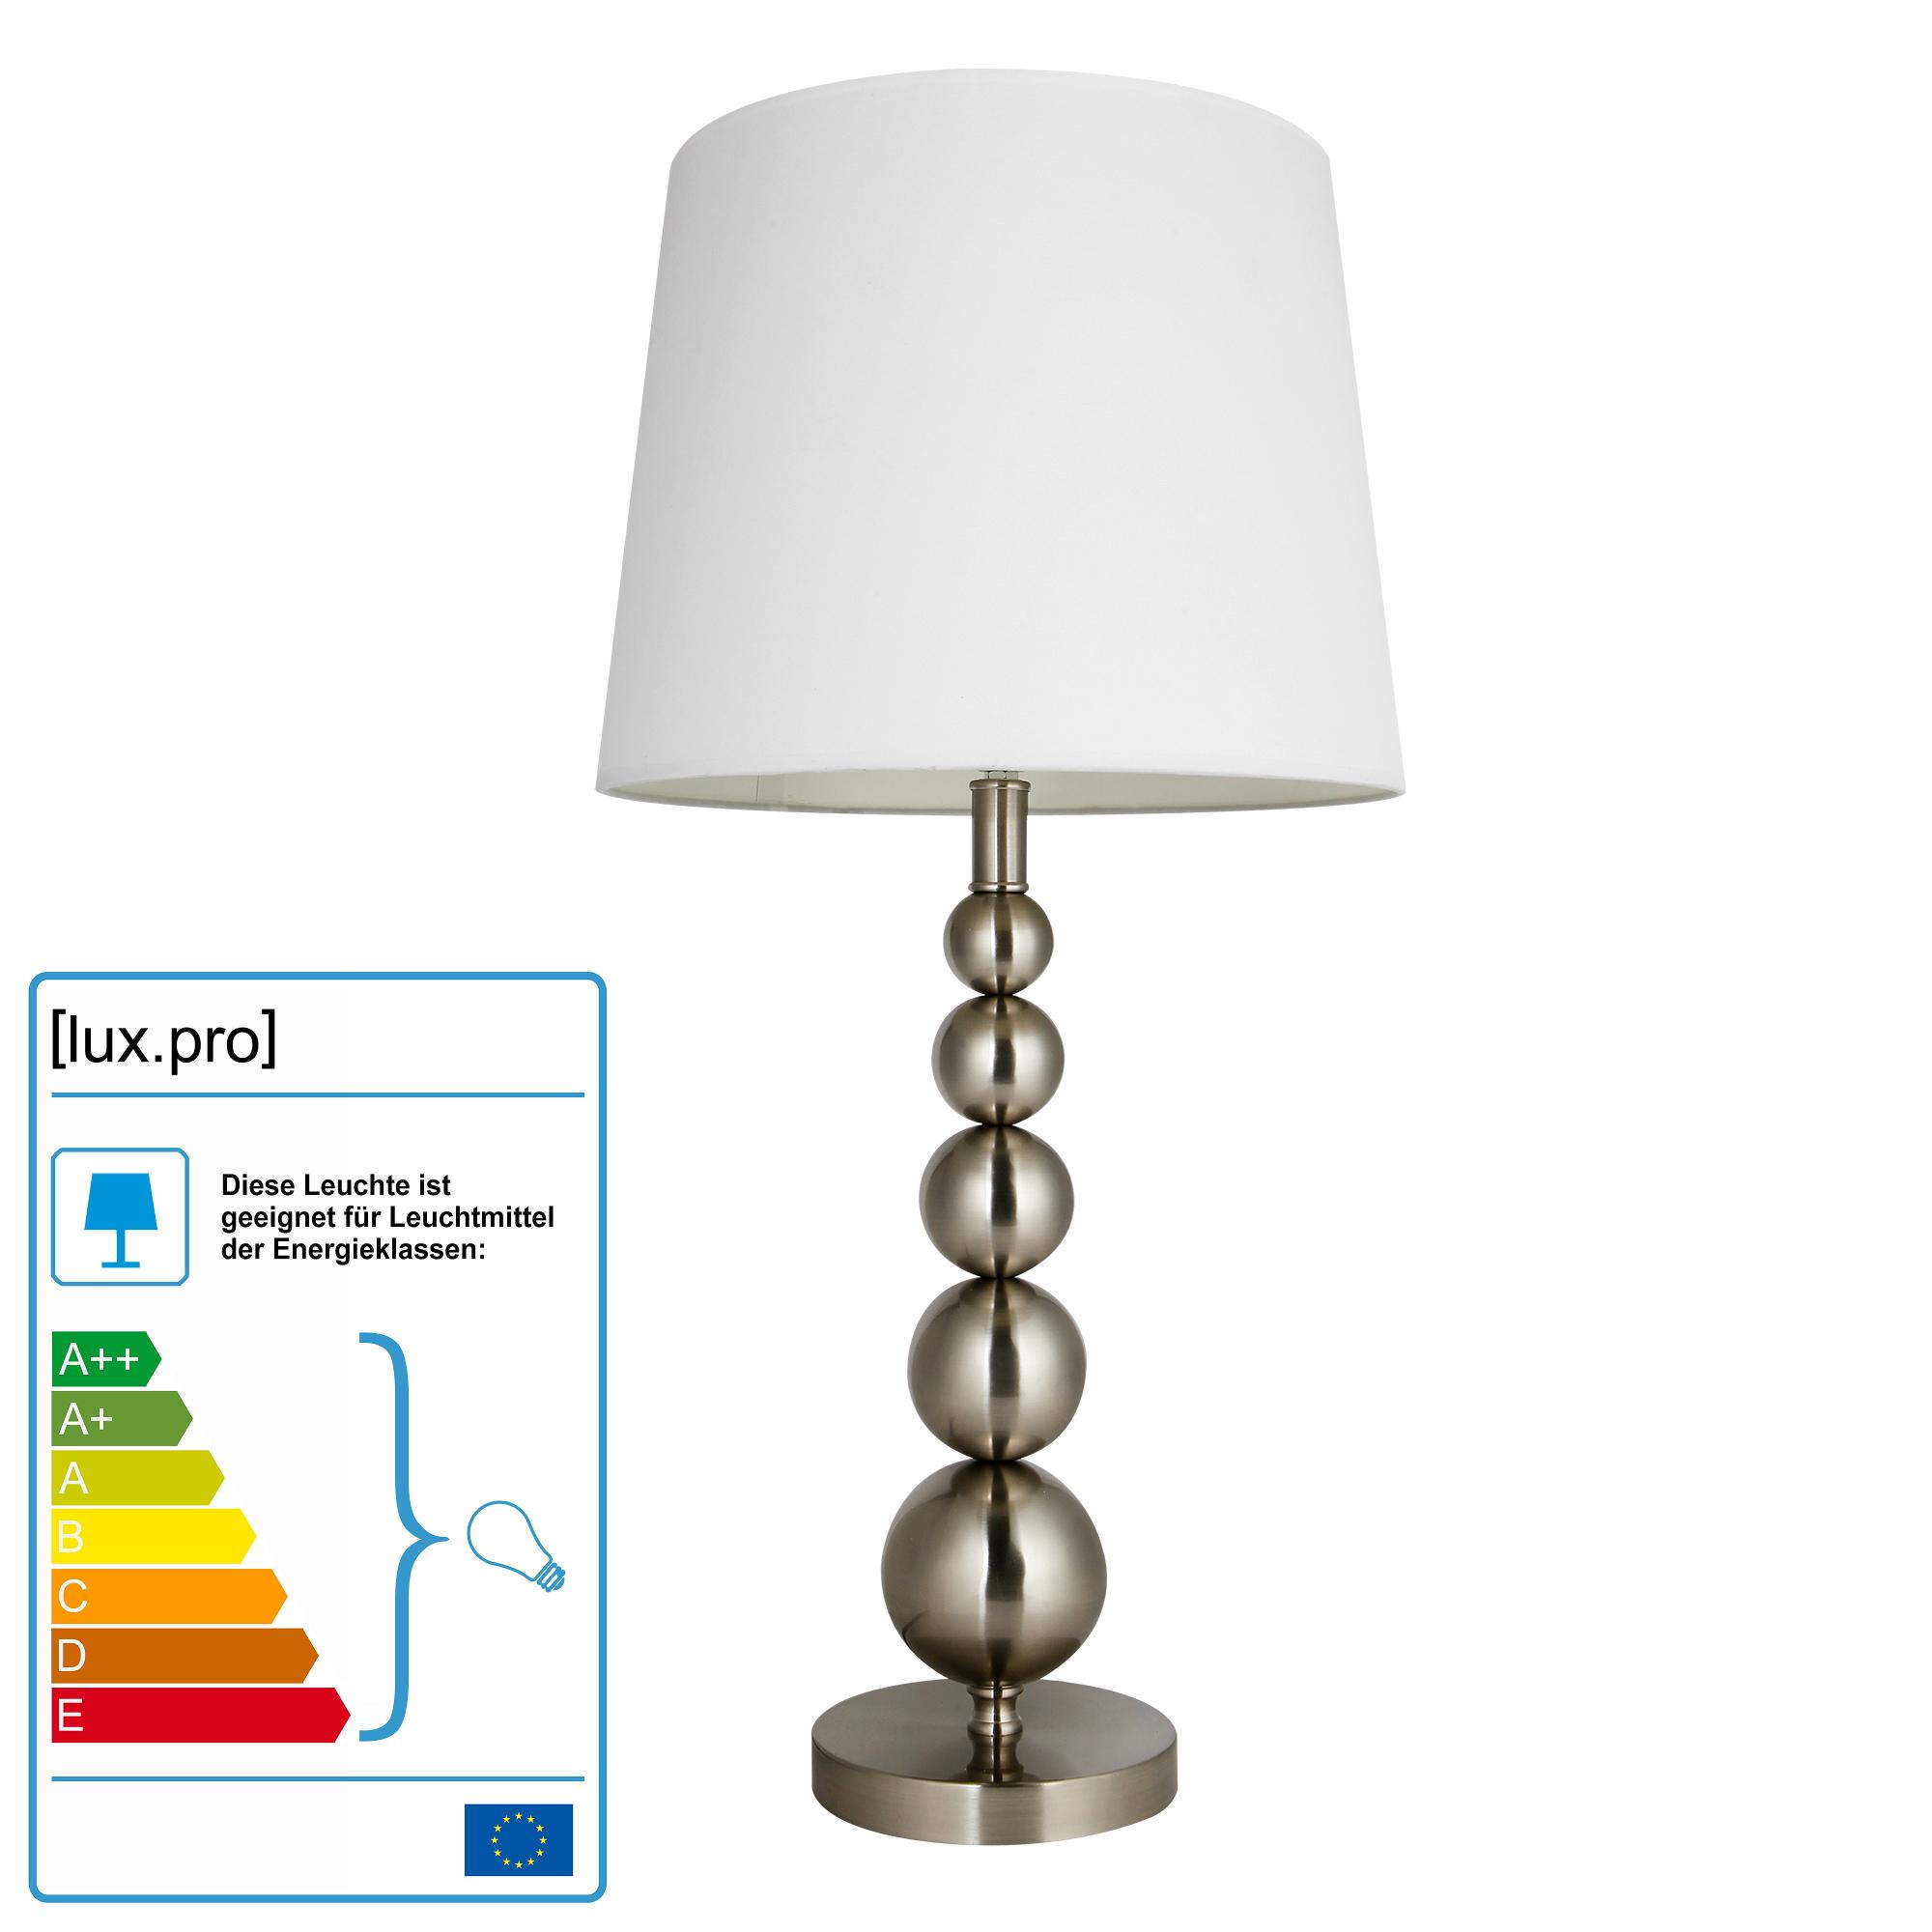 grand lampe de table h52cm 36cm luminaire blanc ebay. Black Bedroom Furniture Sets. Home Design Ideas